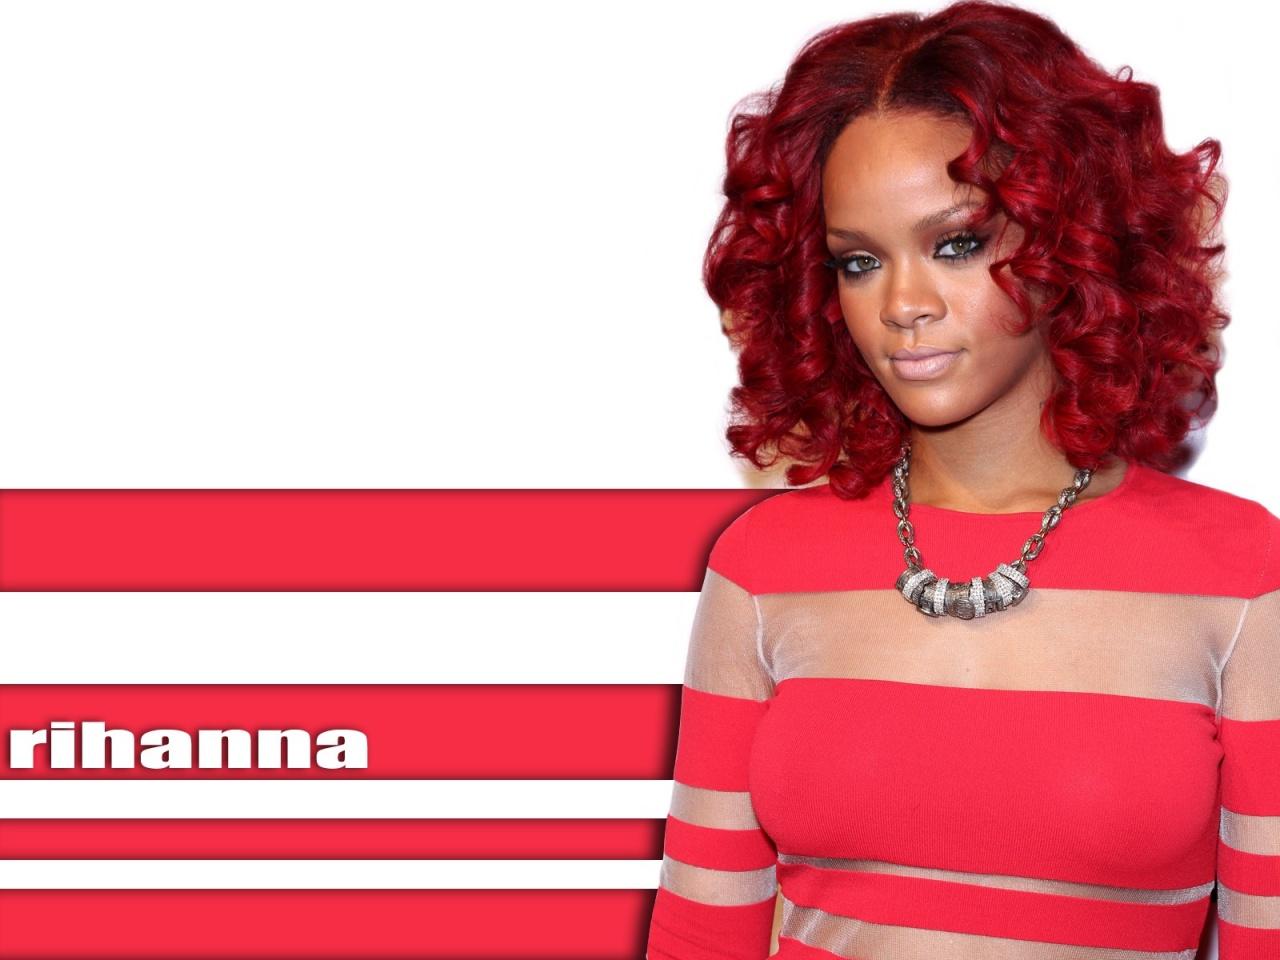 Beautiful Rihanna WallpaperMusic Wallpapers 1280x960